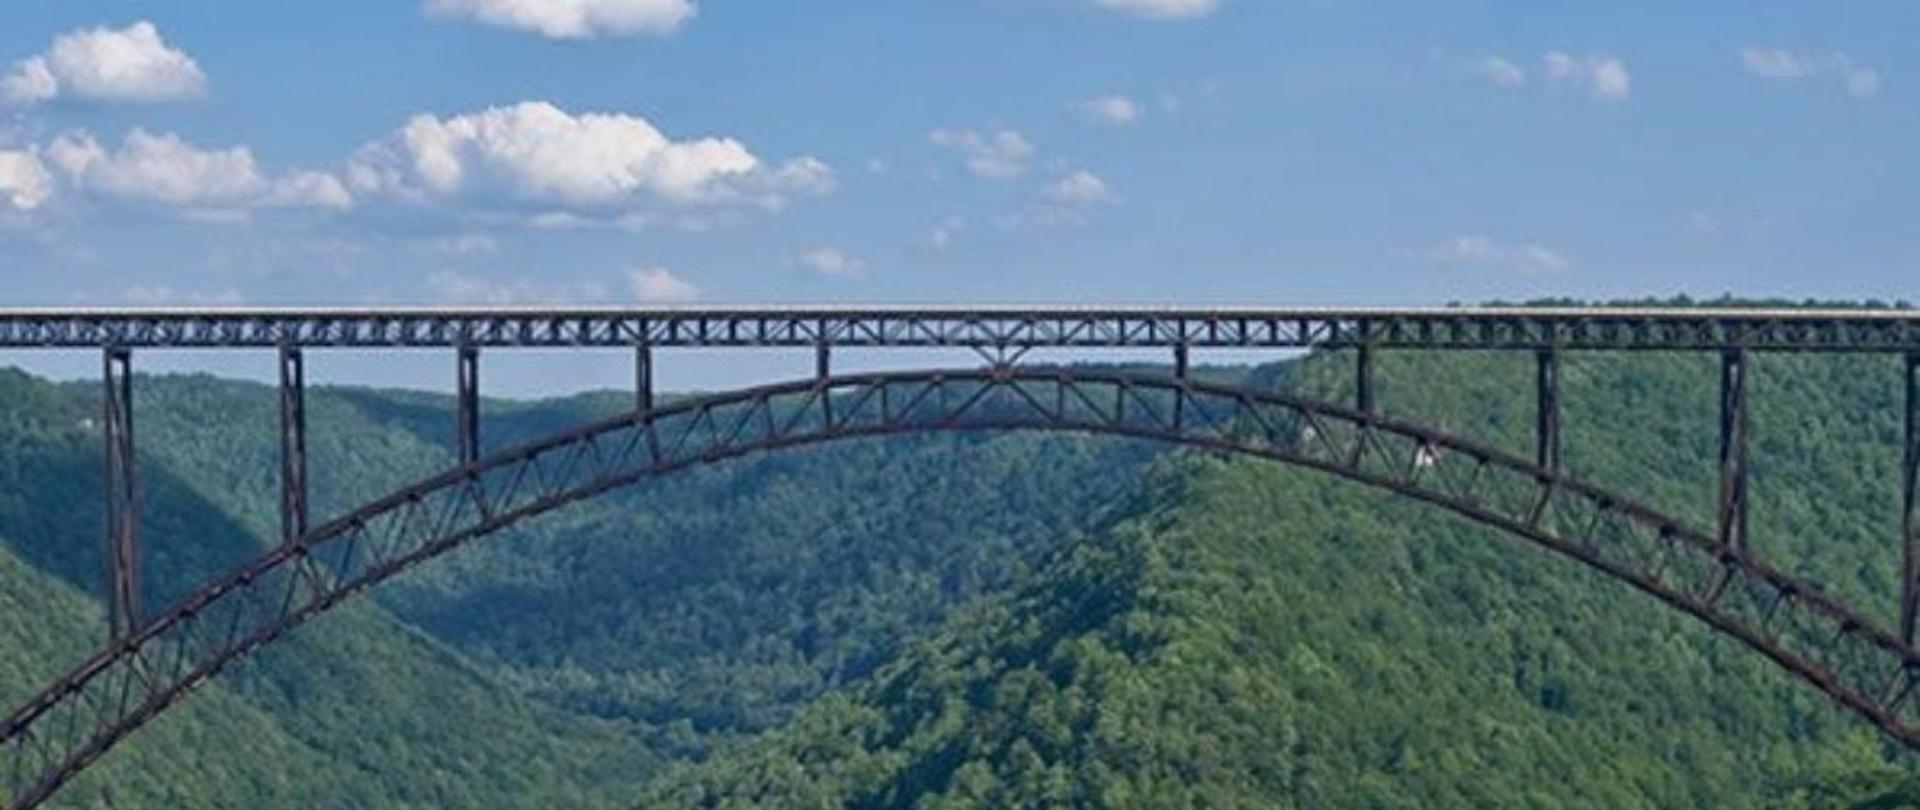 slide-new-river-gorge-bridge.jpg.1140x481_0_31_19063.jpg